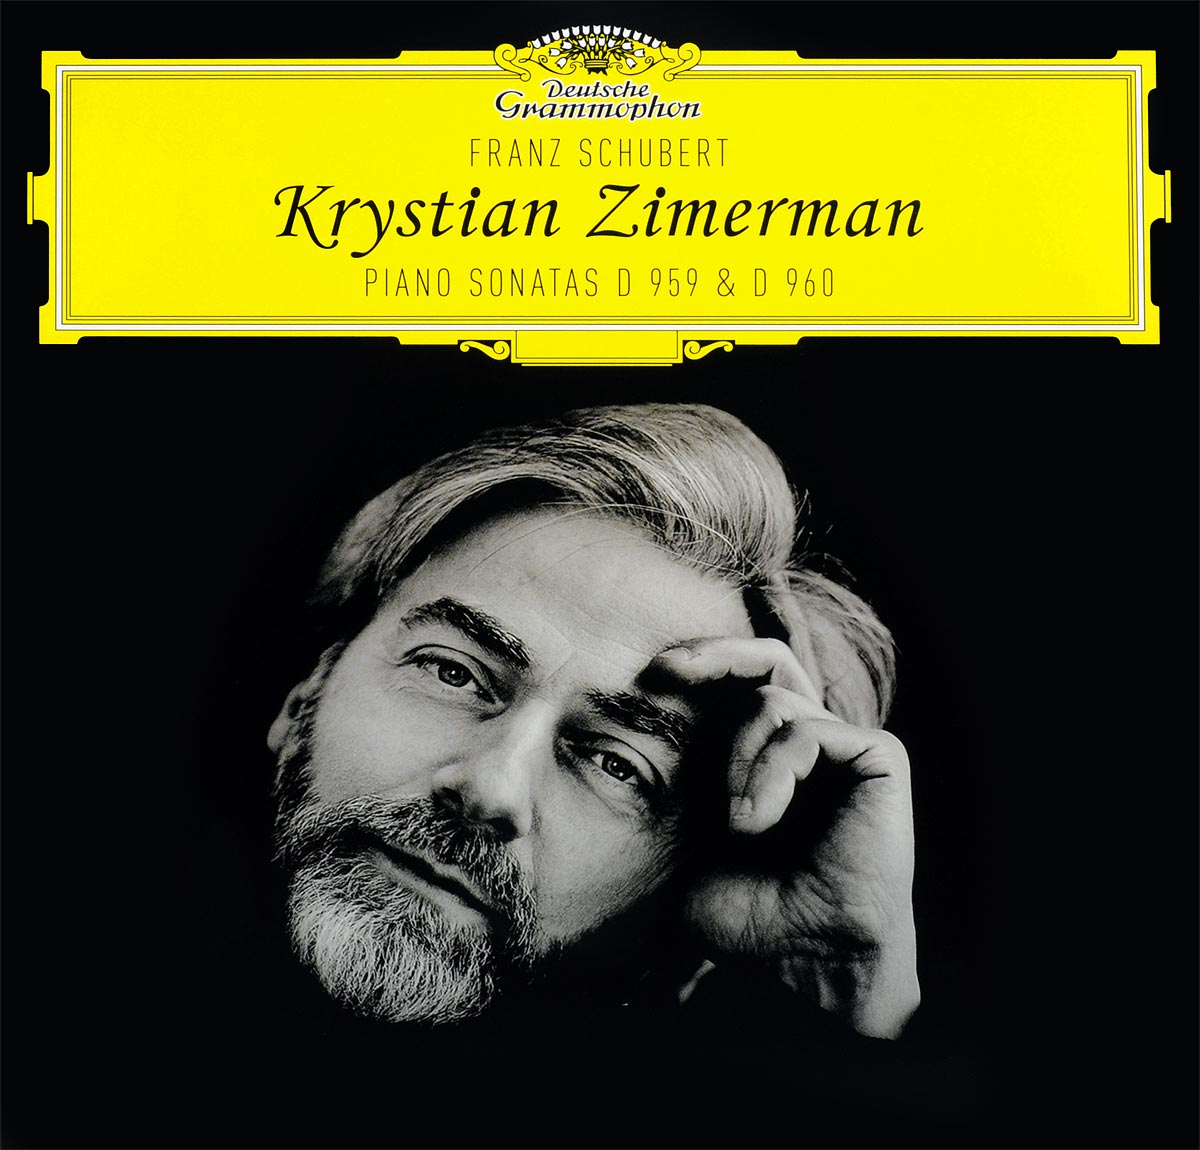 Krystian Zimerman, Schubert: Piano Sonatas D 959 & D 960 (2 LP)